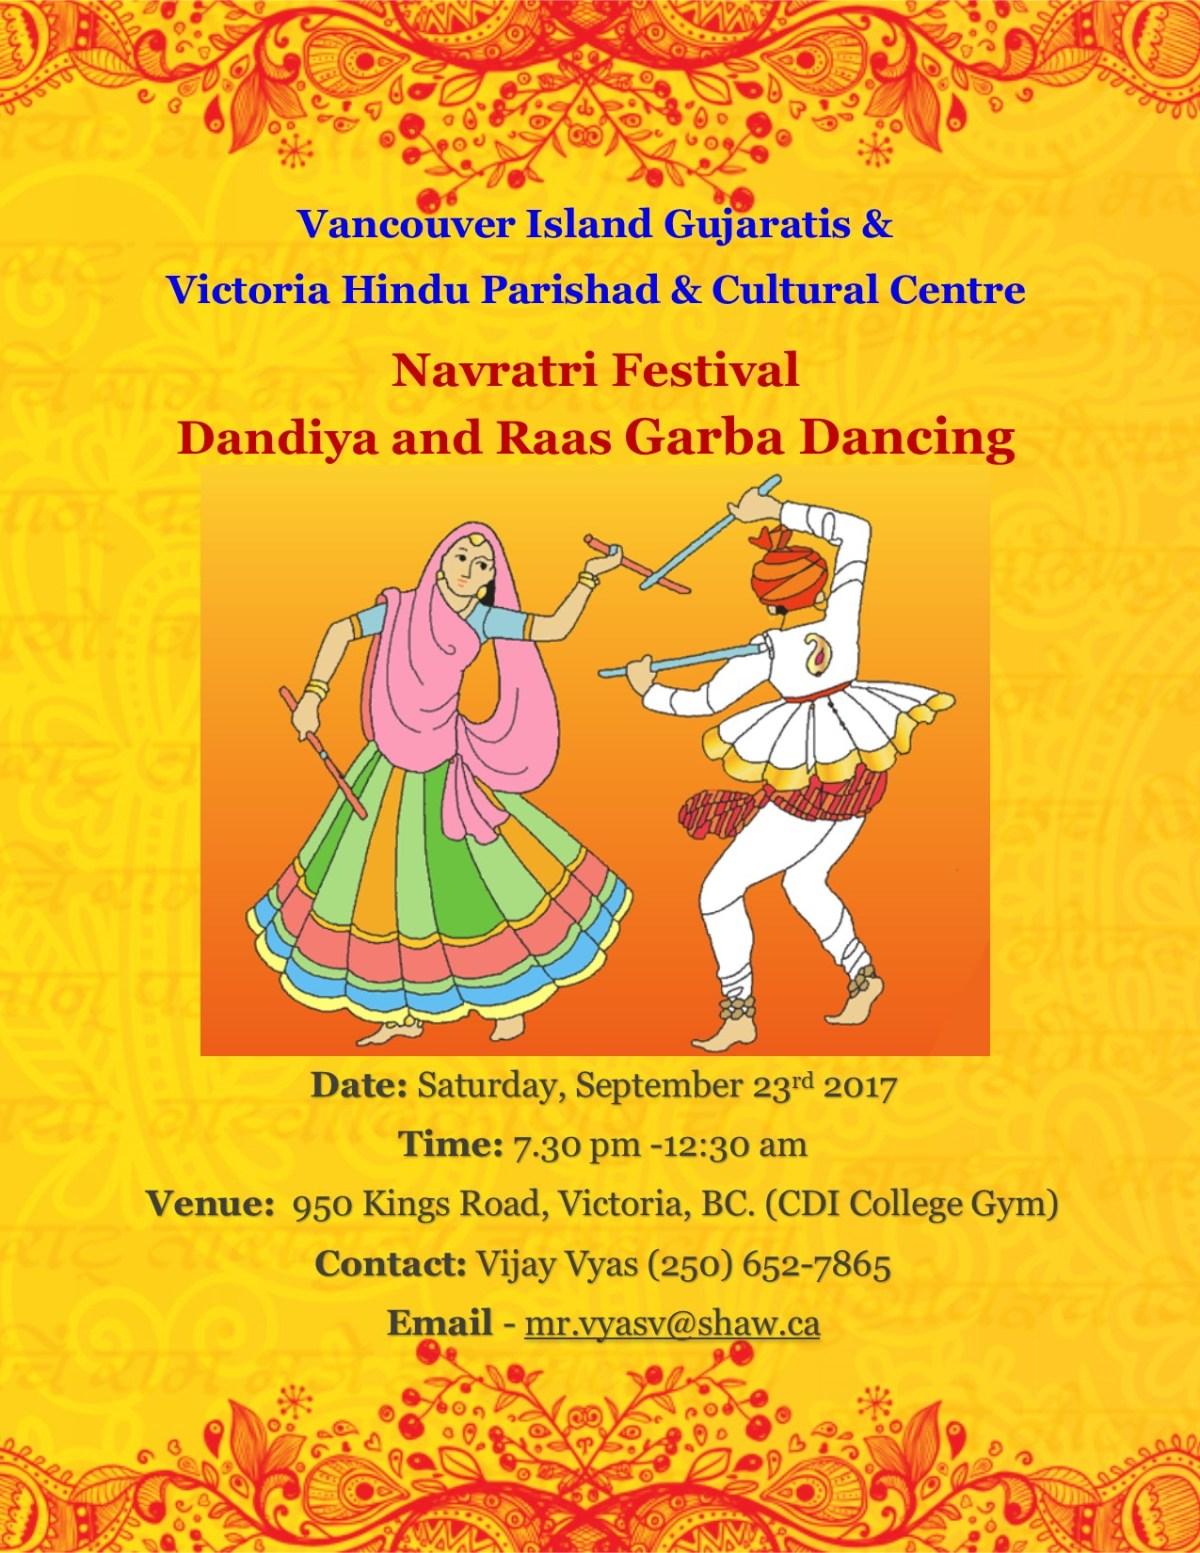 navratri-festival--dandia--raas-garba-dancing---saturday--september-23-2017--730pm-2017-events-victoria-hindu-temple